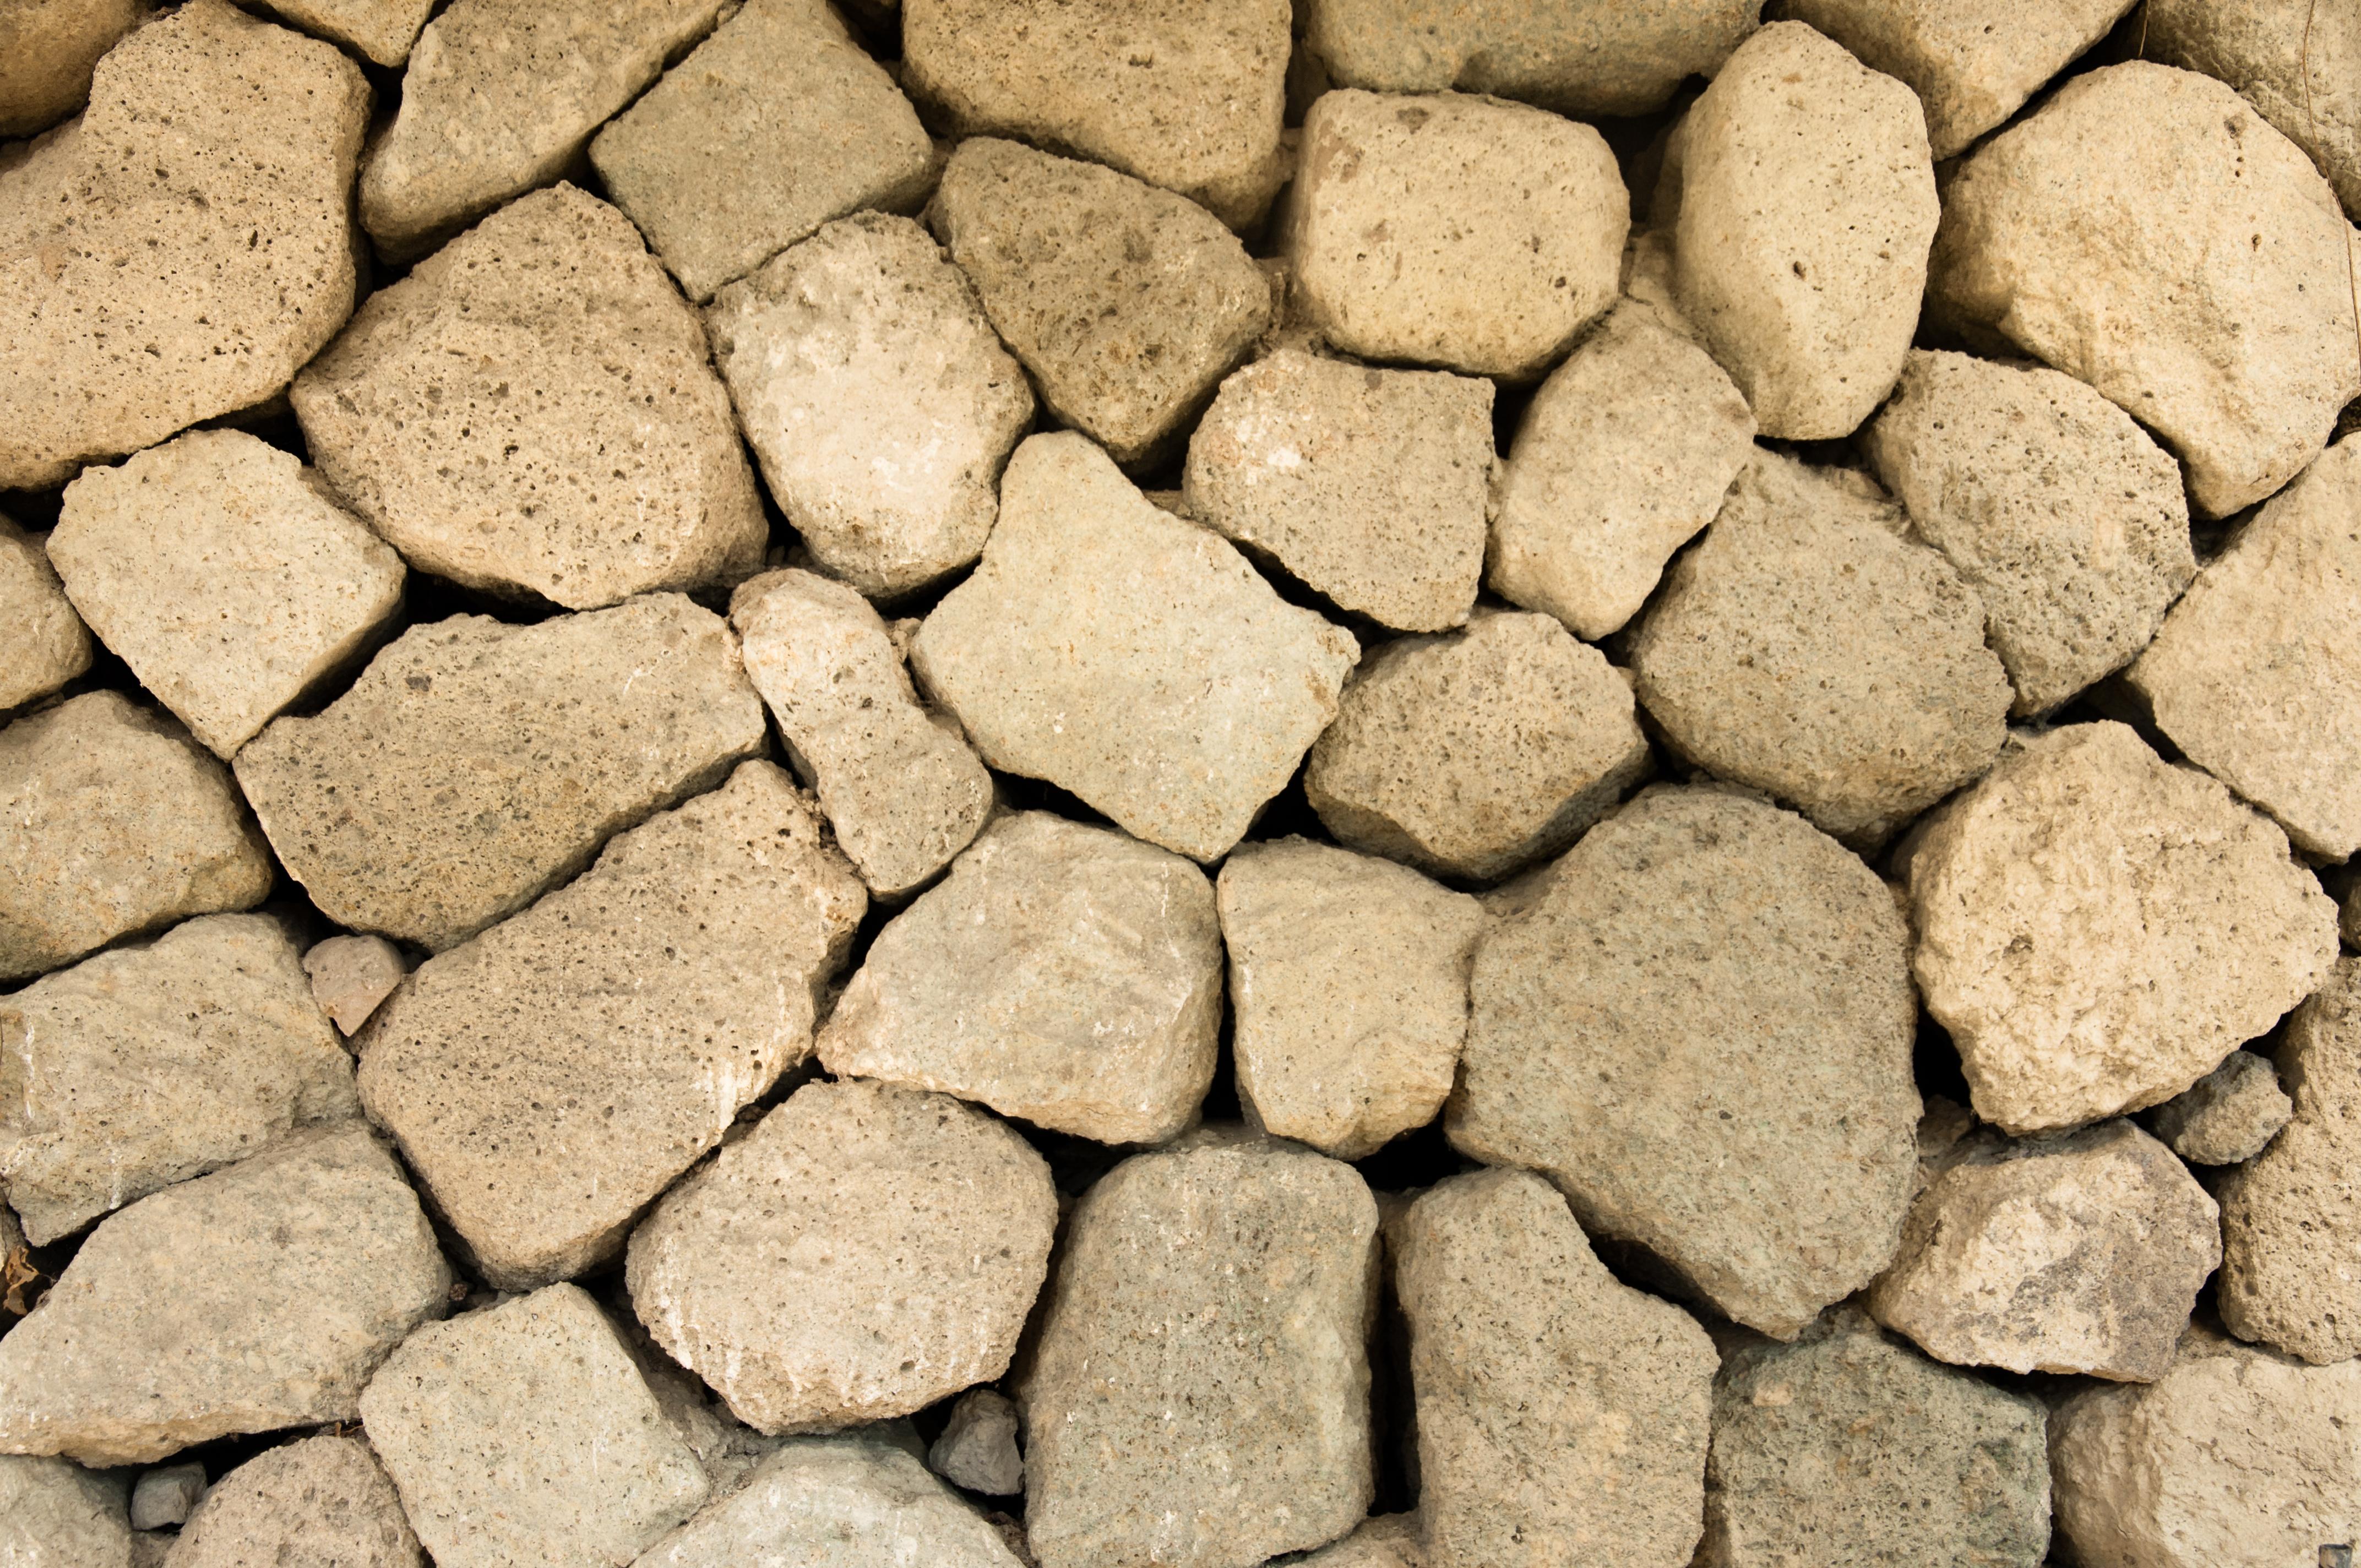 Stones texture, Abstract, Shapes, Natural, Nature, HQ Photo